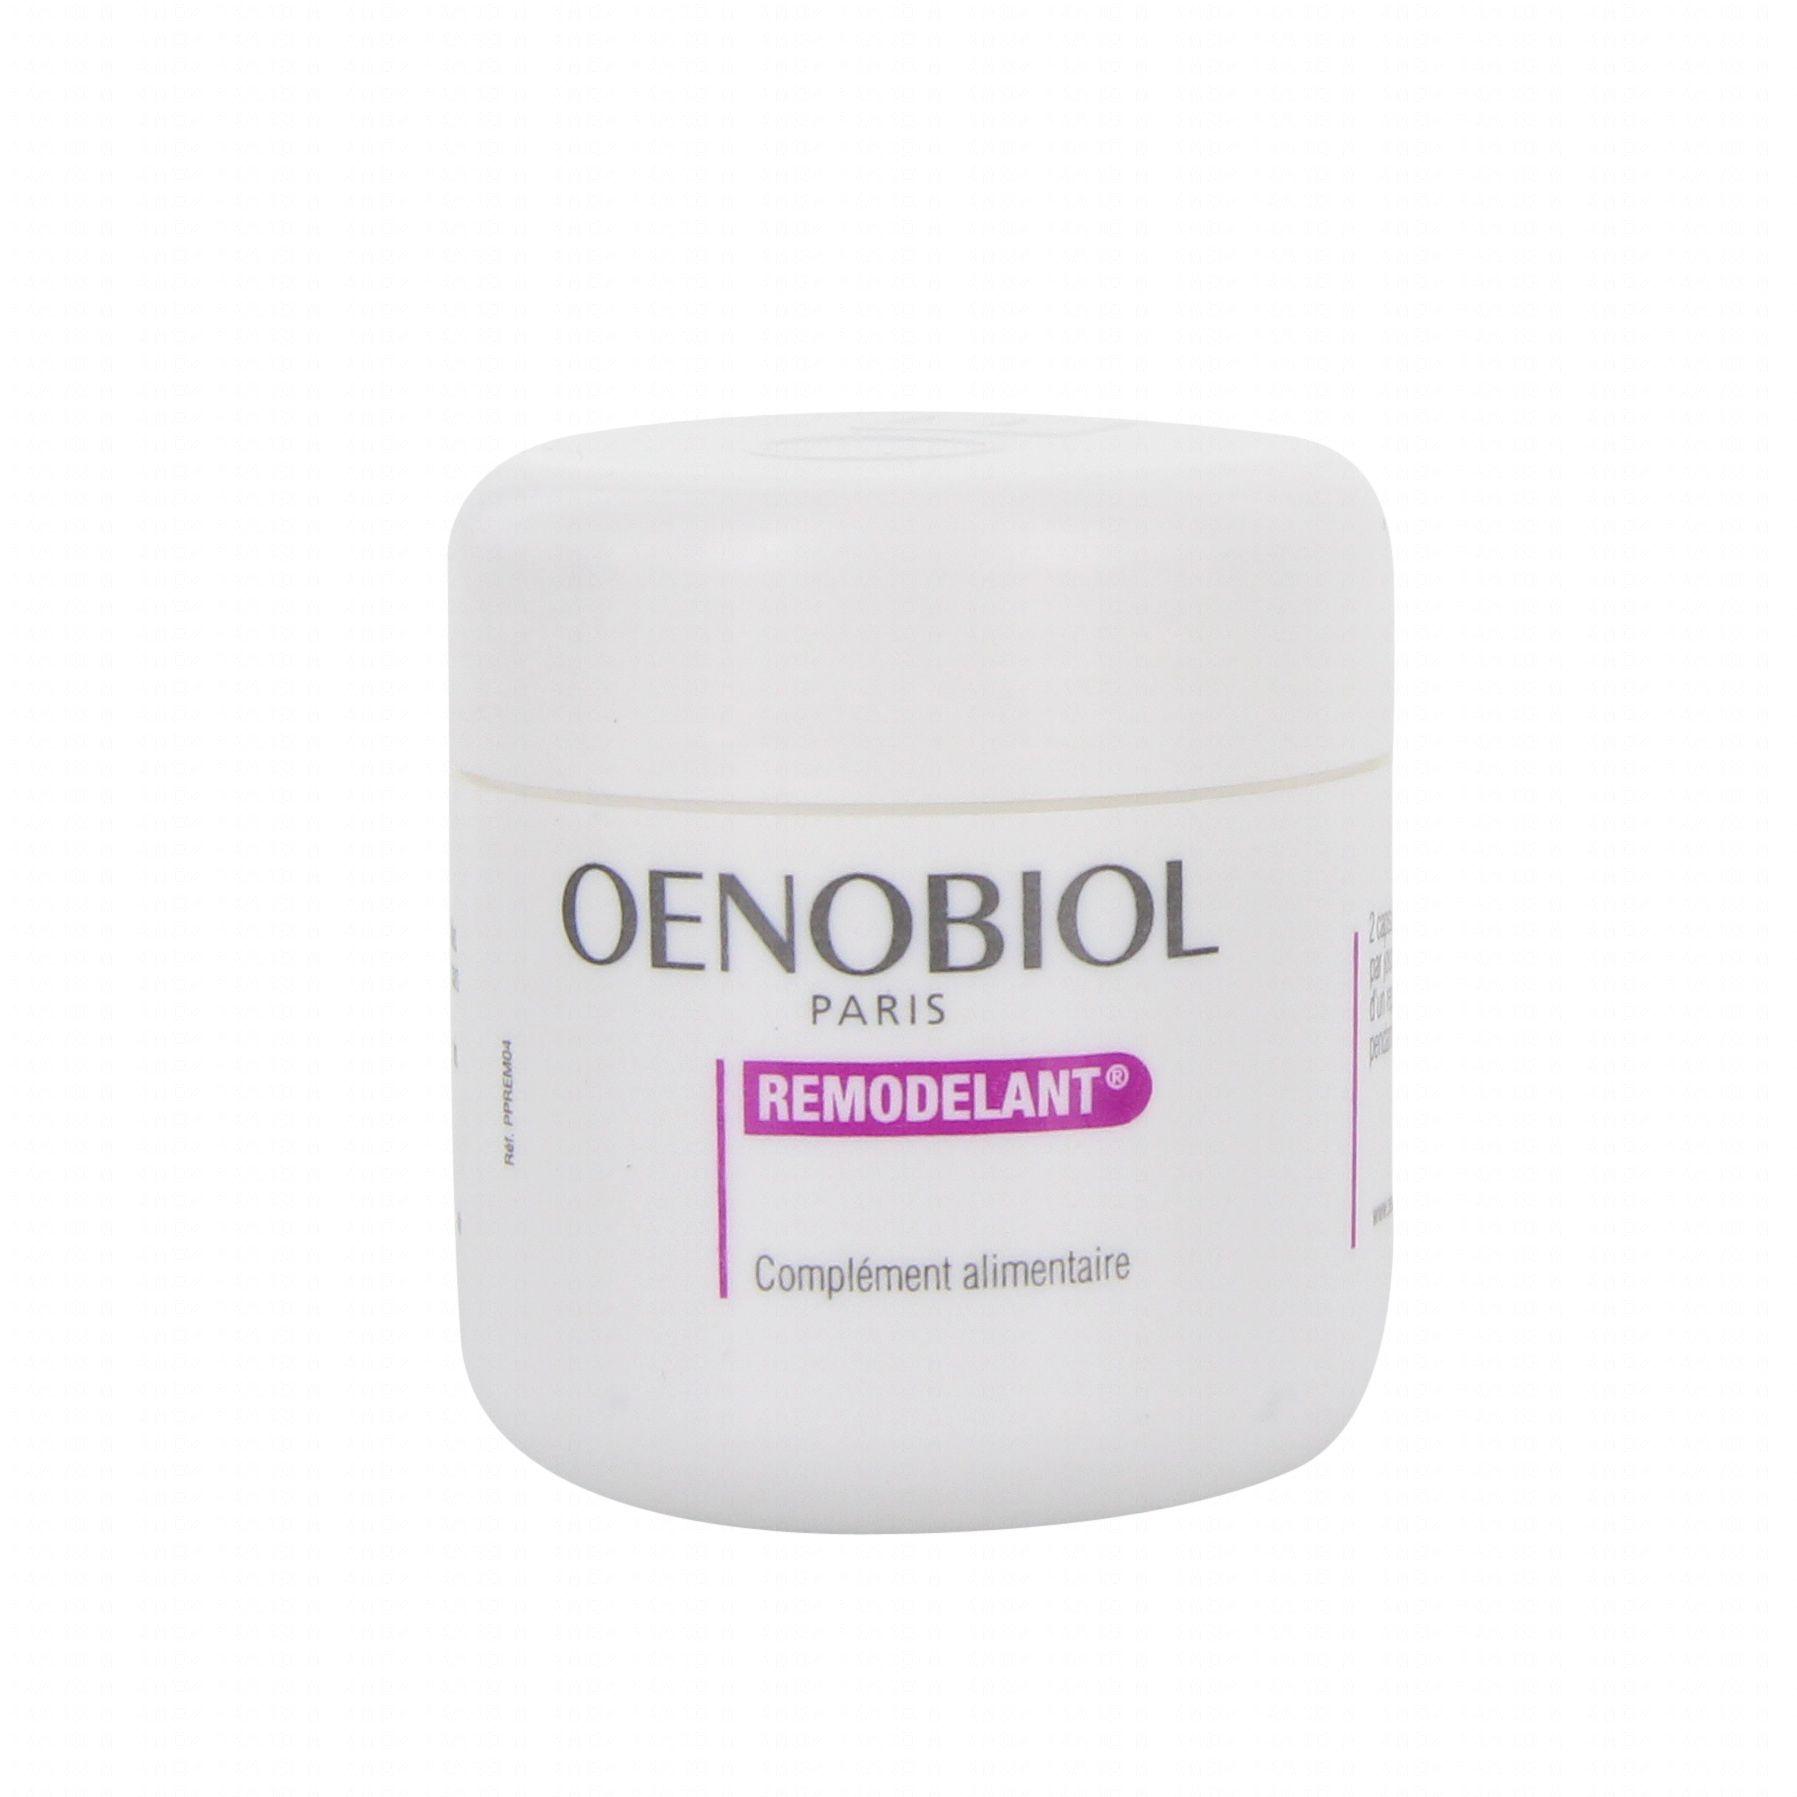 OENOBIOL Remodelant 60 capsules - Parapharmacie en ligne